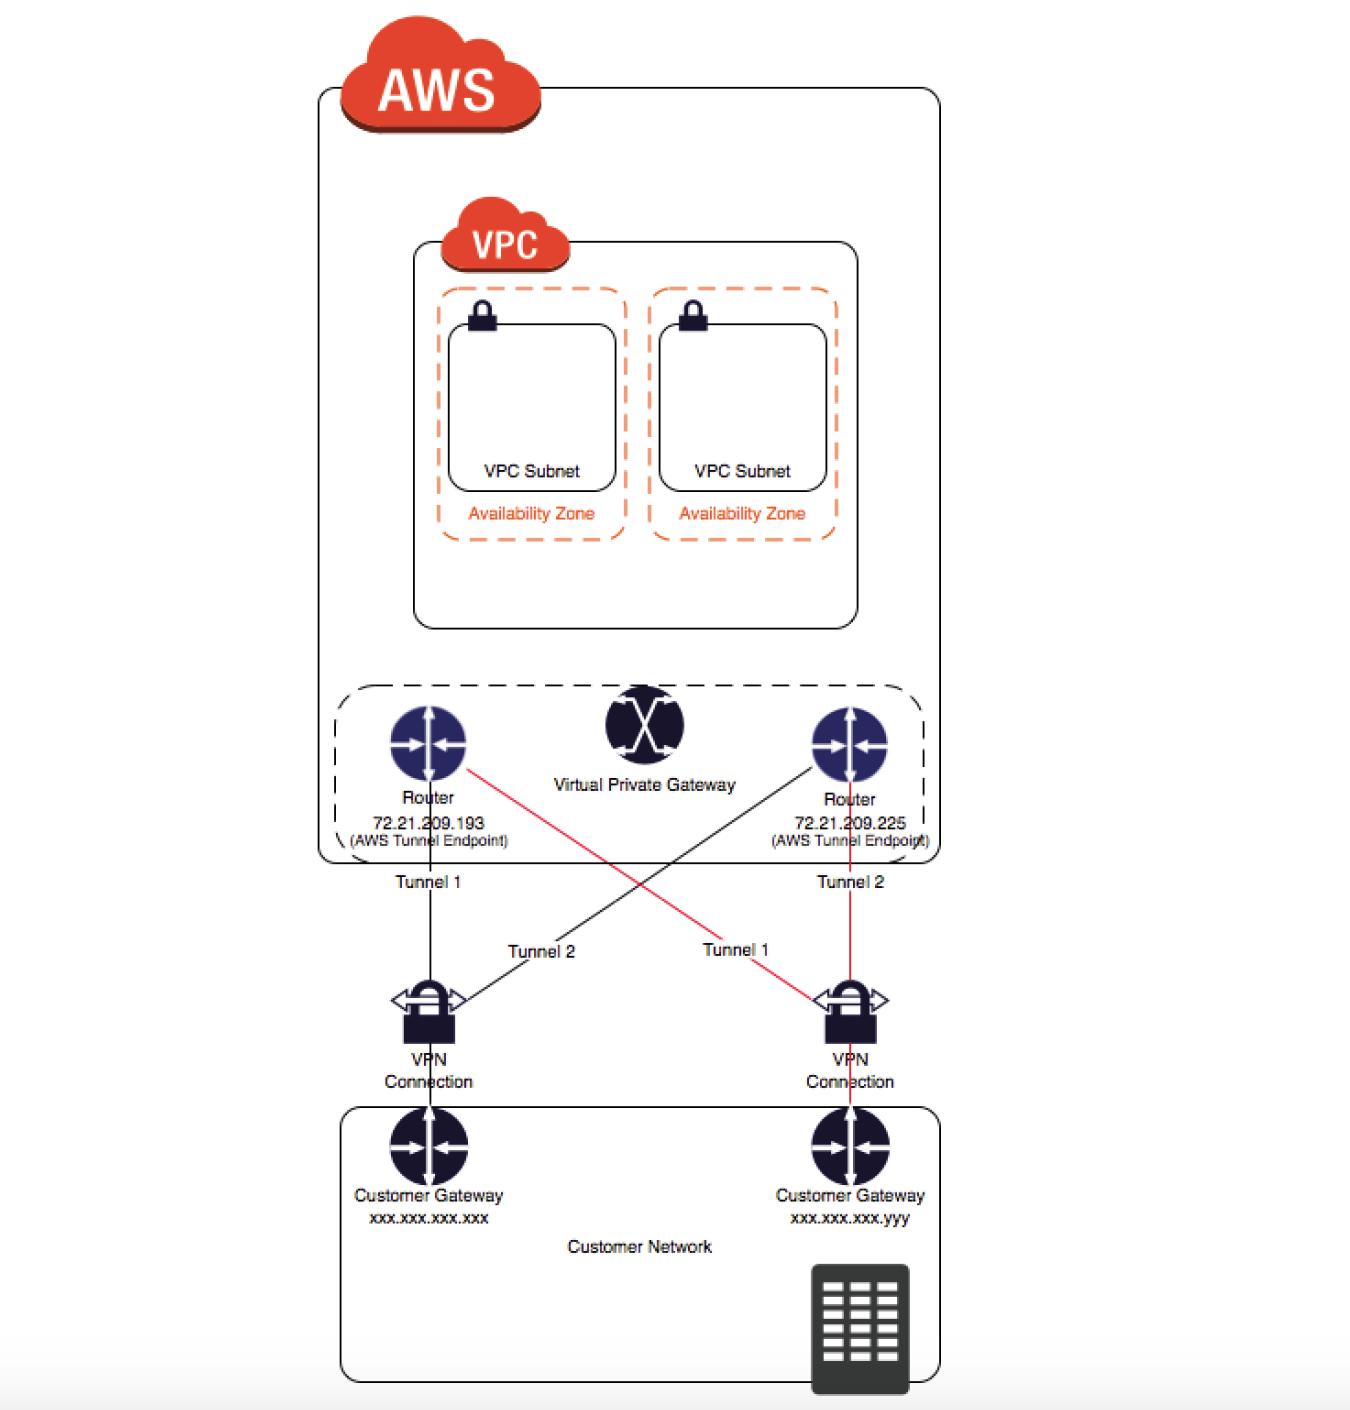 VPN Connection Redundancy